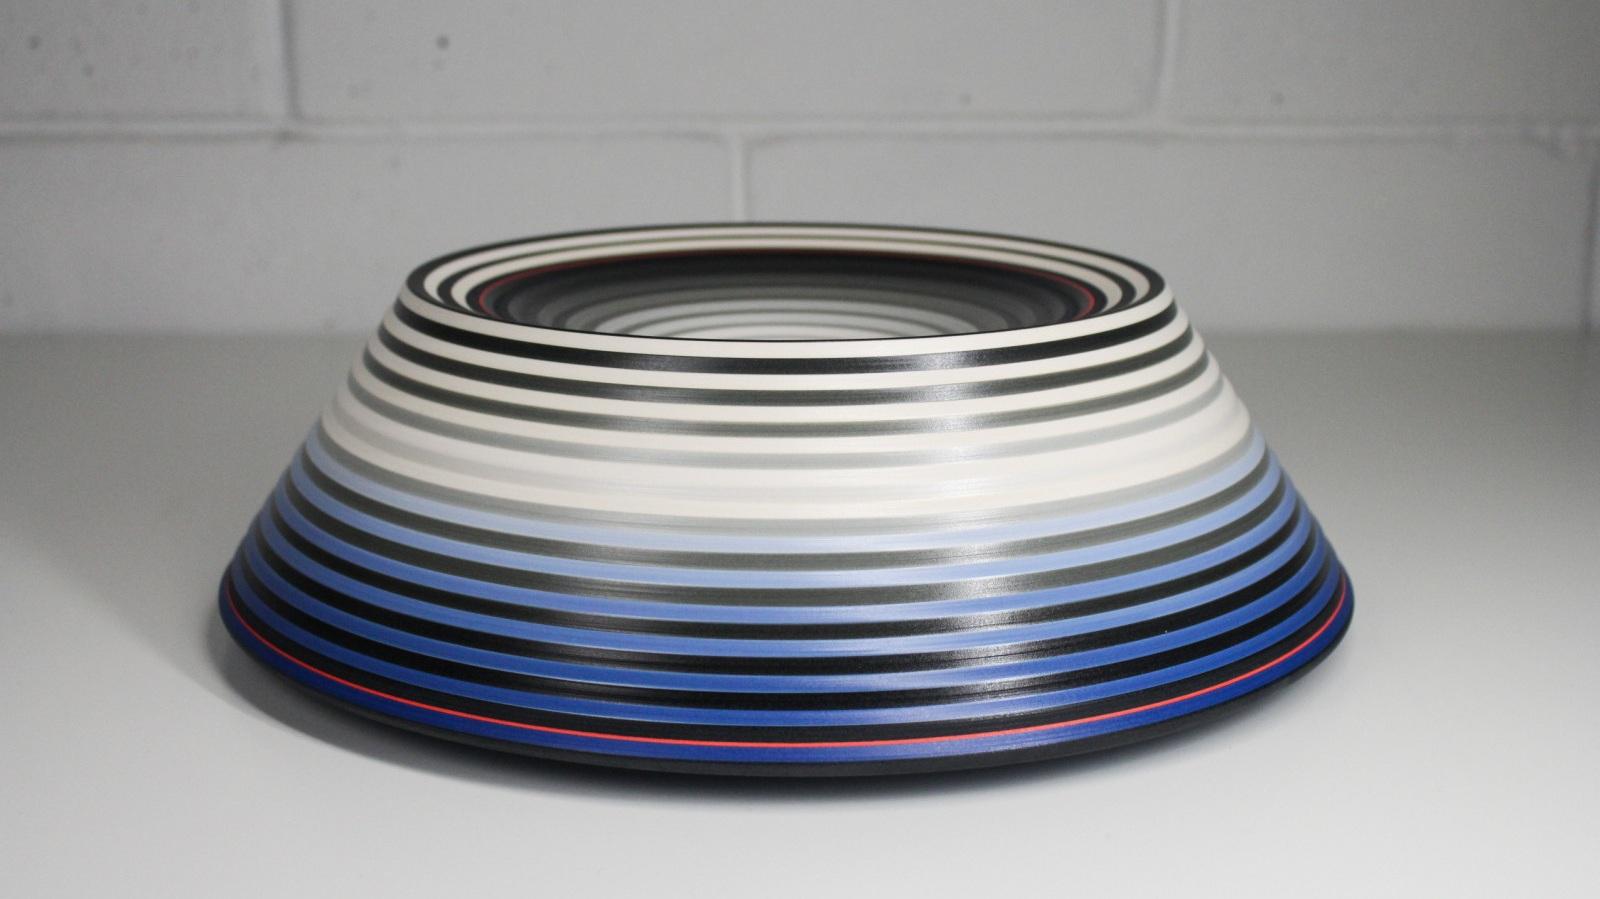 OPject - Mountain Ridged Form , Earthenware, 14 × 35 × 35 cm